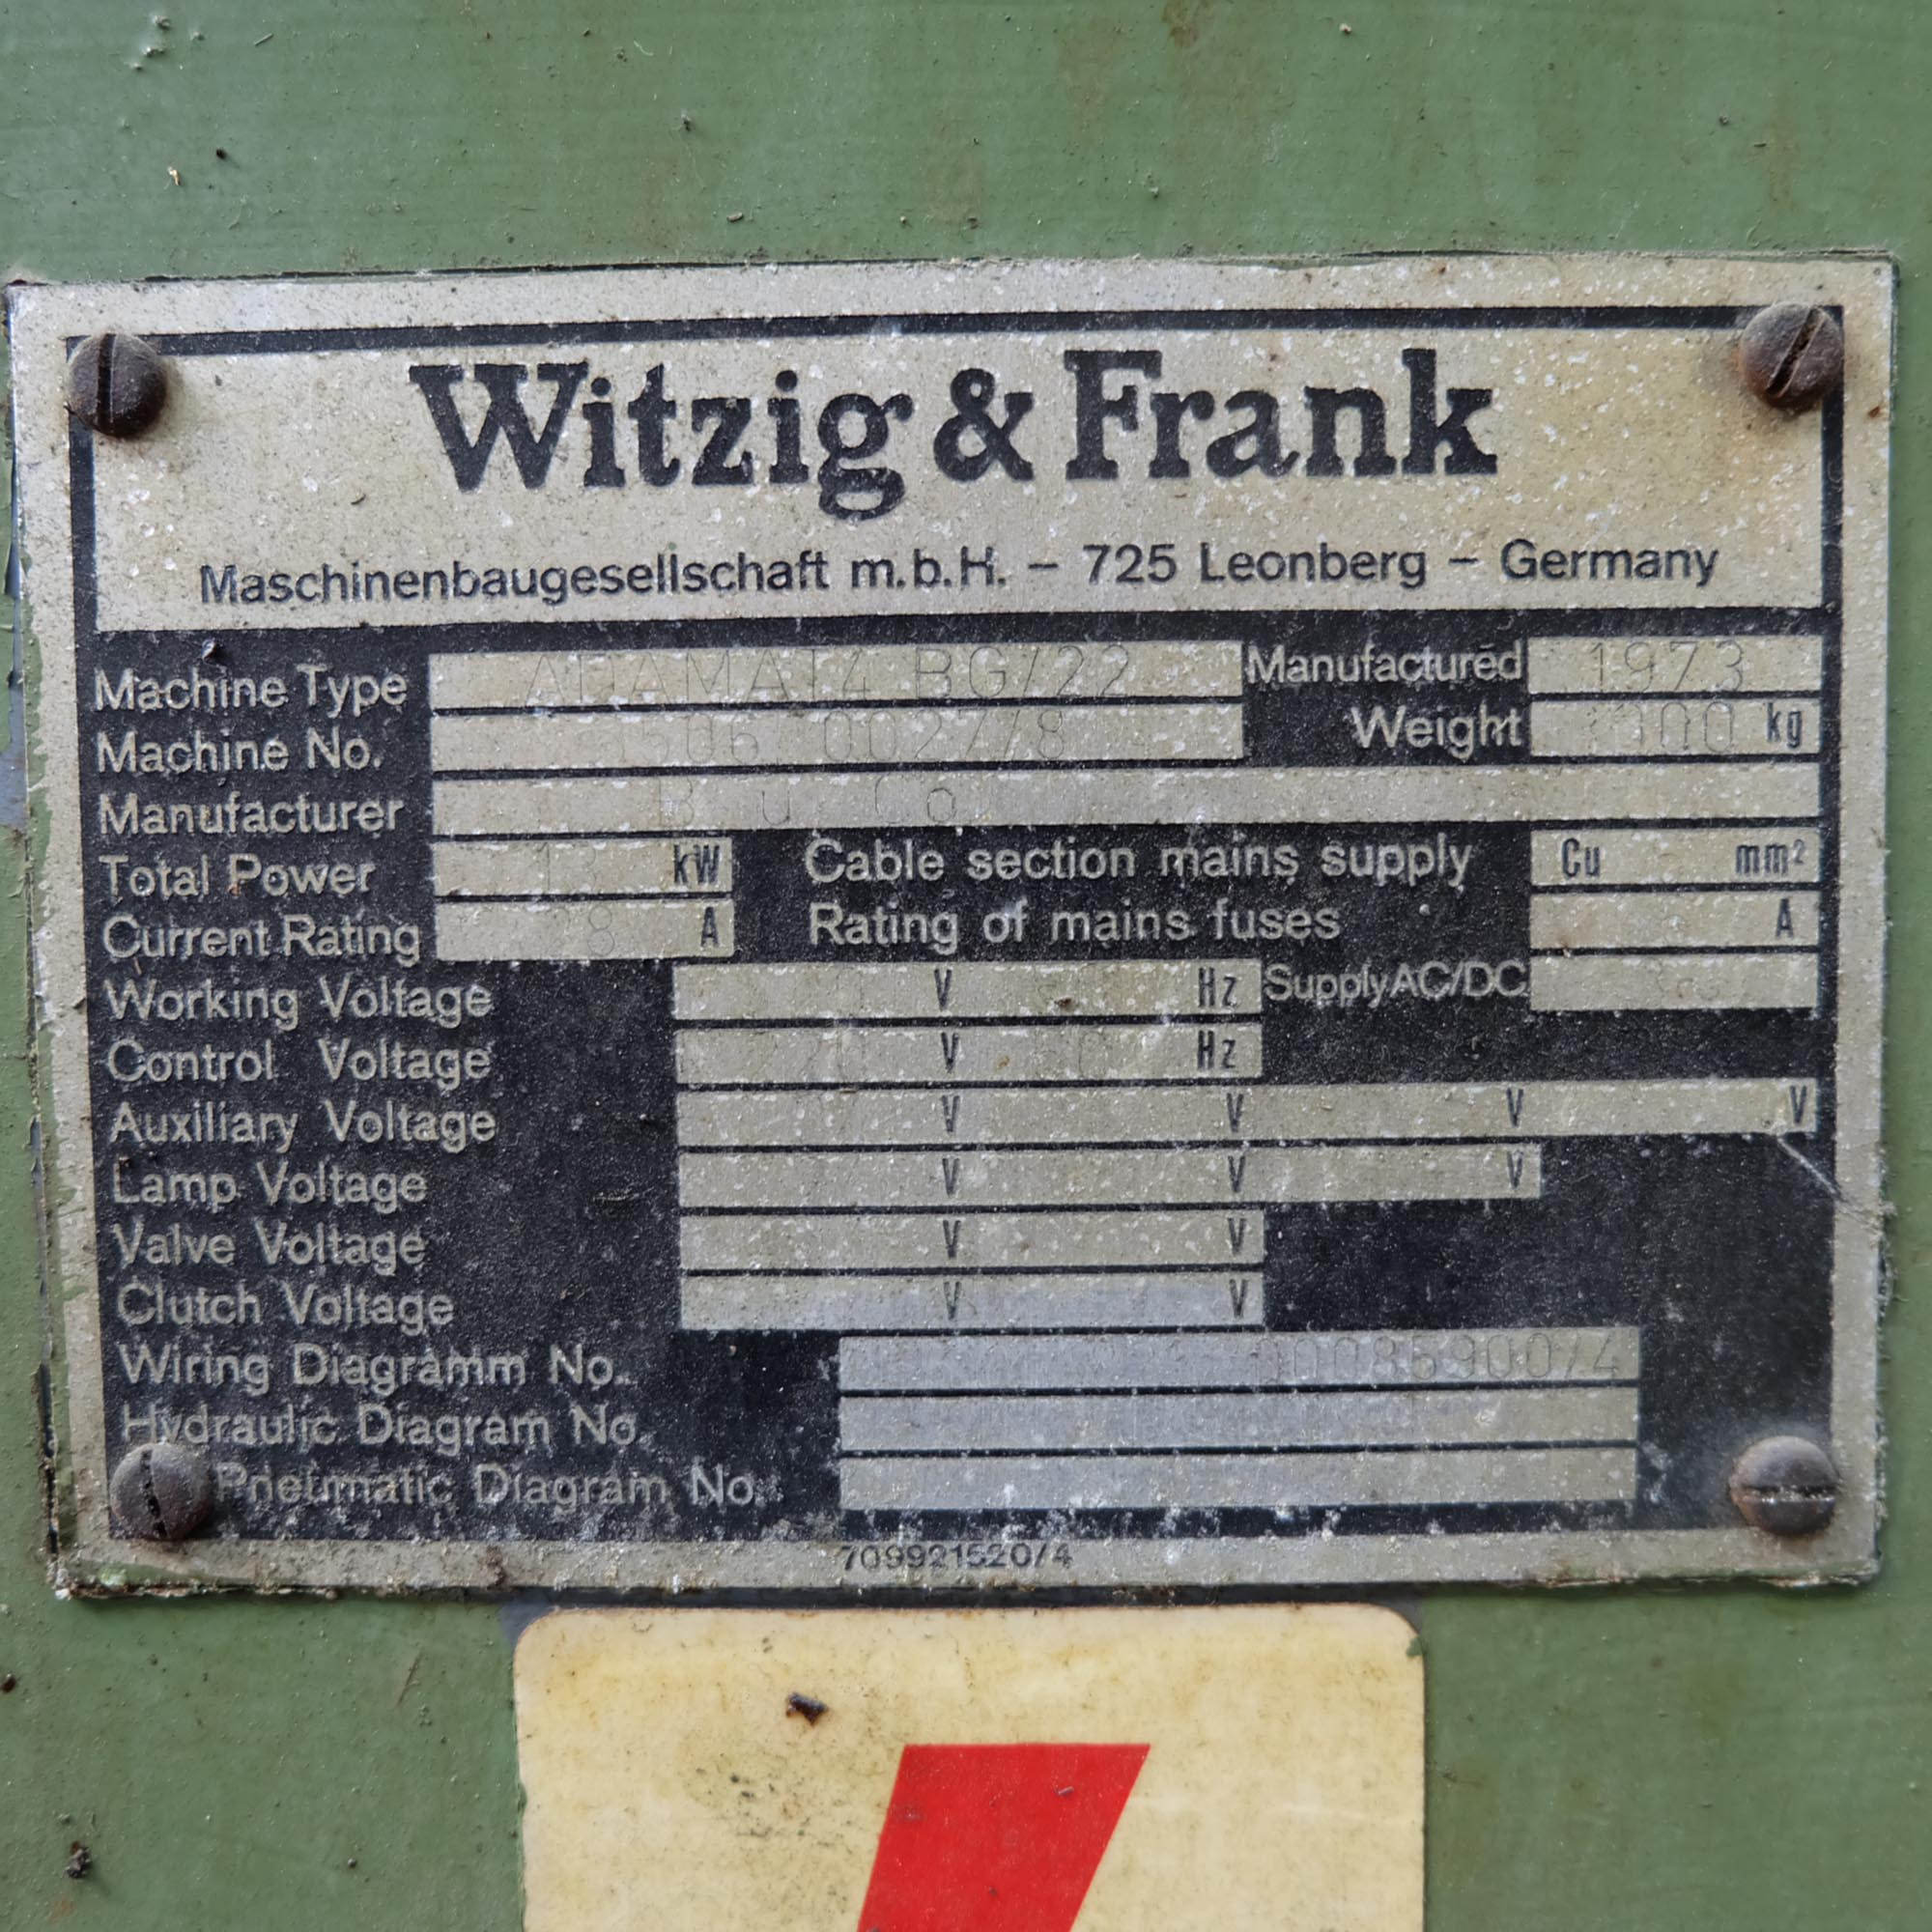 Witzig & Frank Model Adamat 4 BG/22. Six Station Indexing Rotary Transfer Machine. - Image 10 of 11